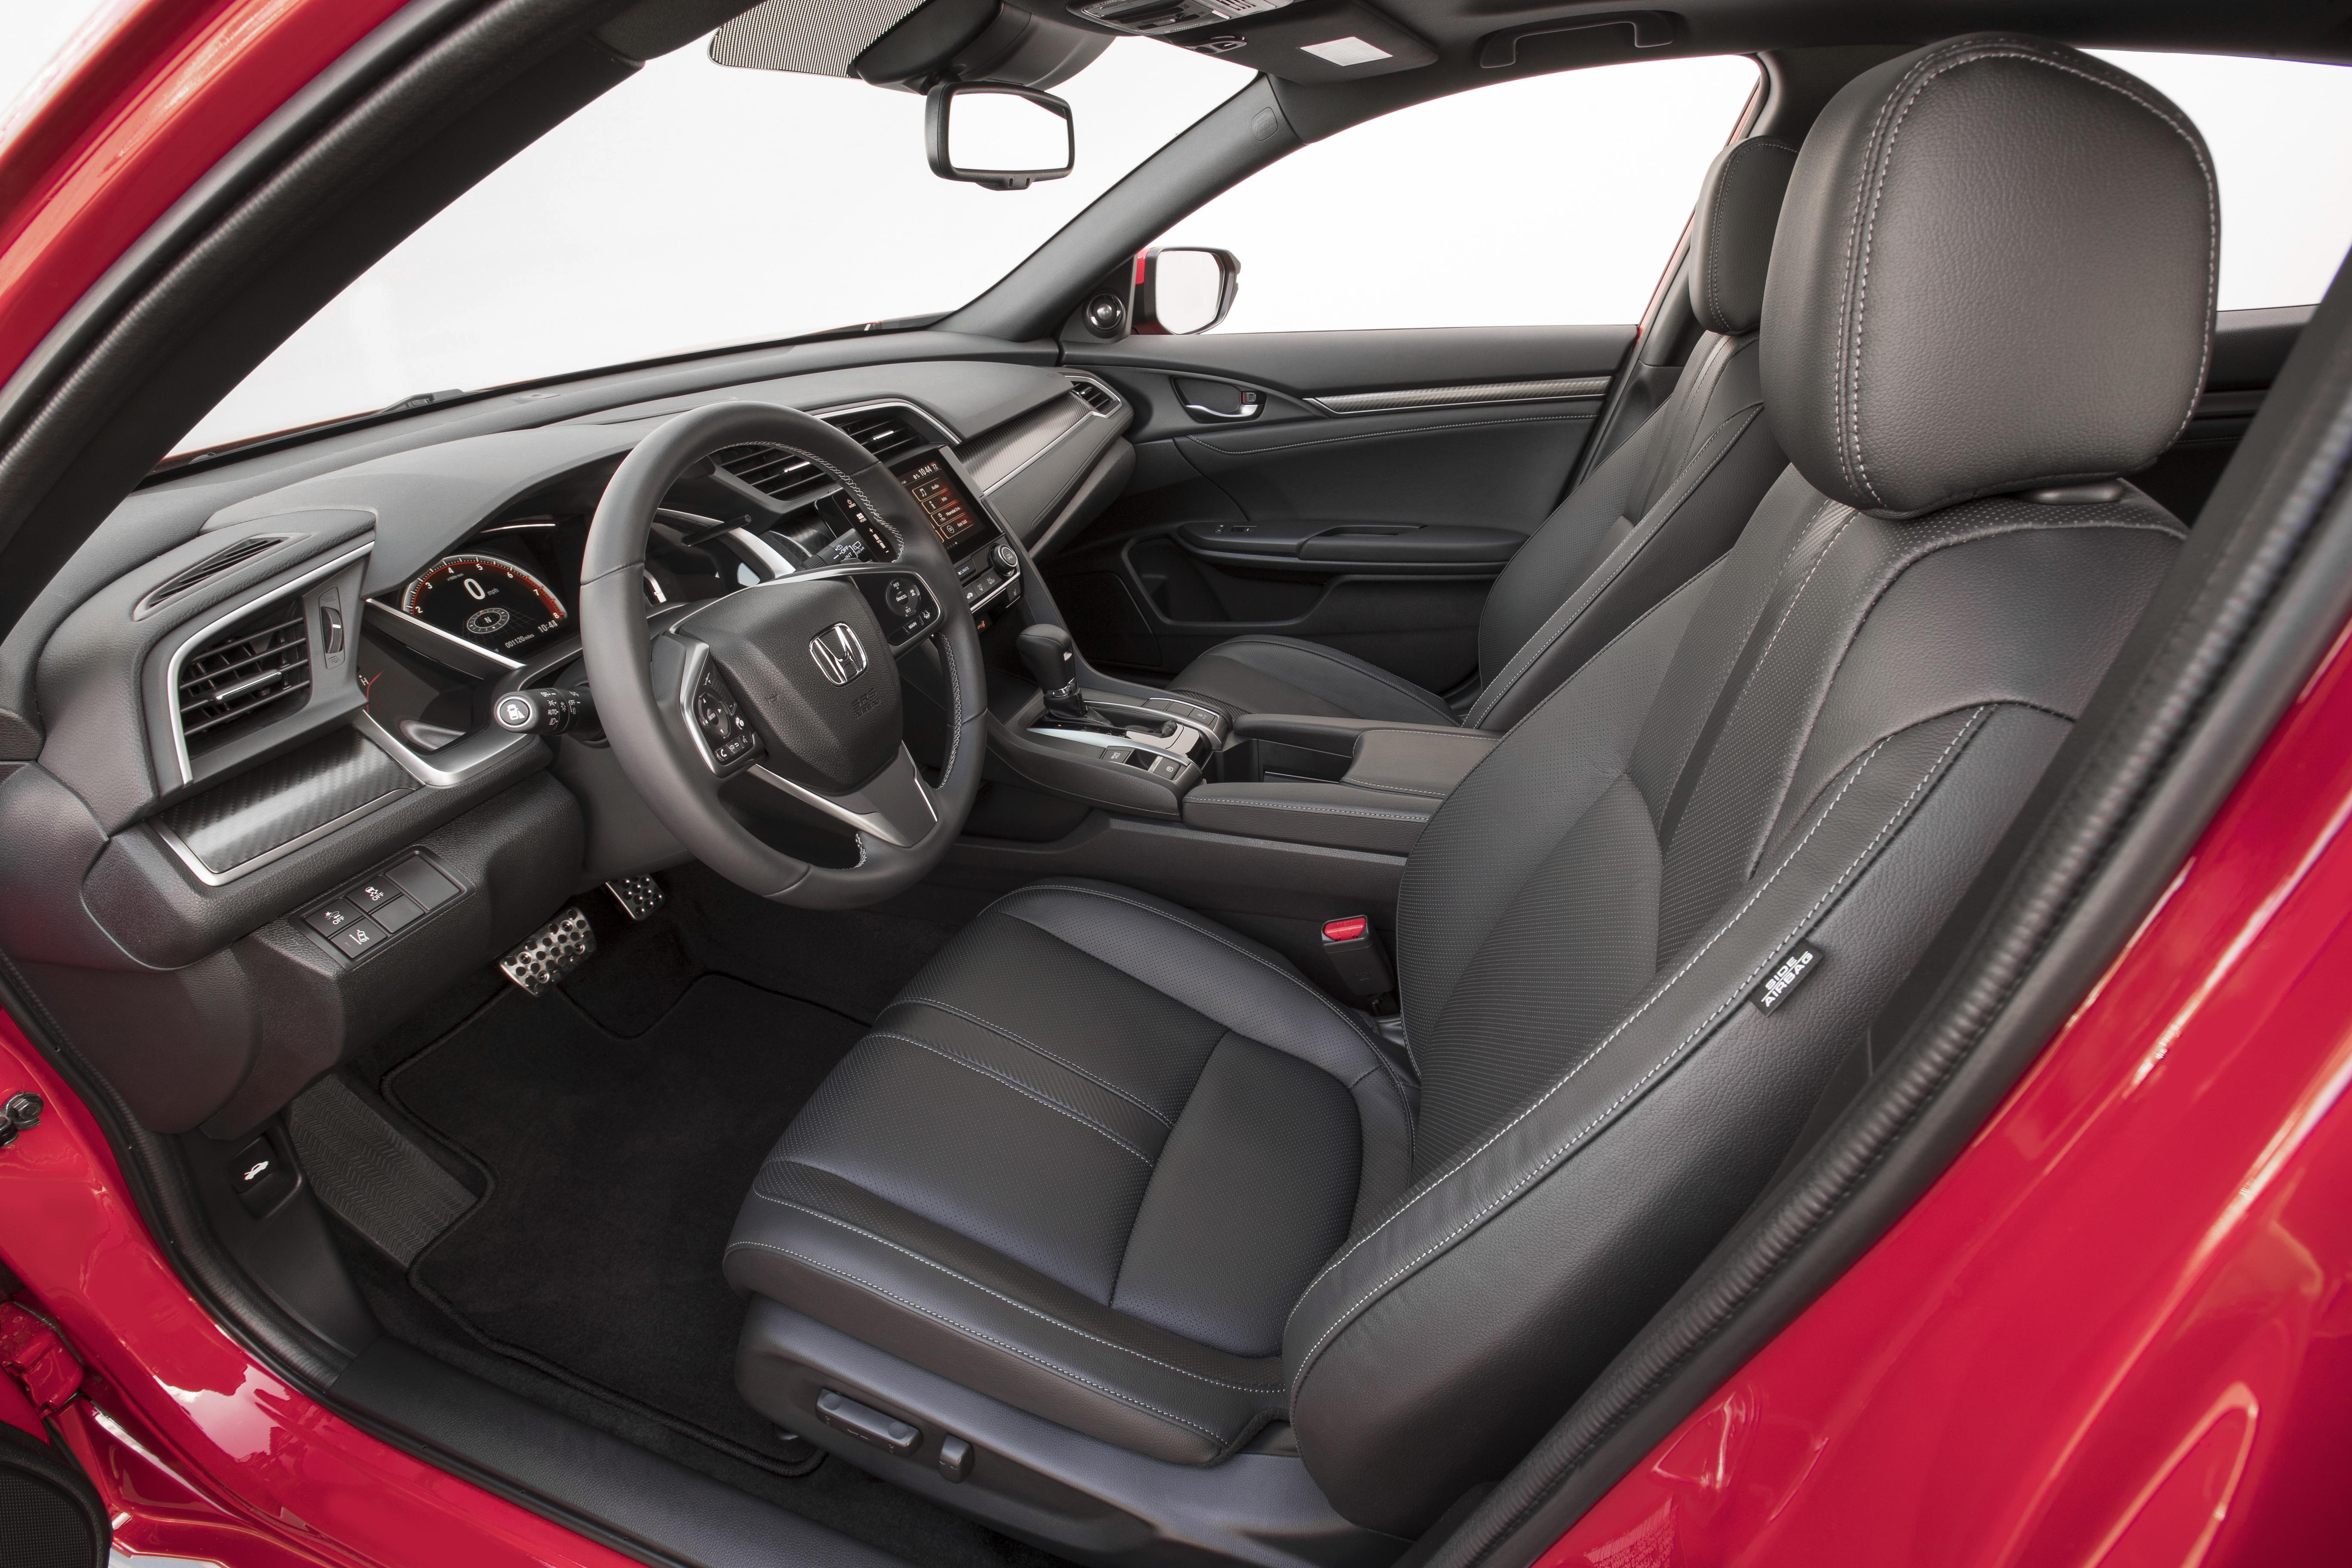 2017 honda civic manual hatchback